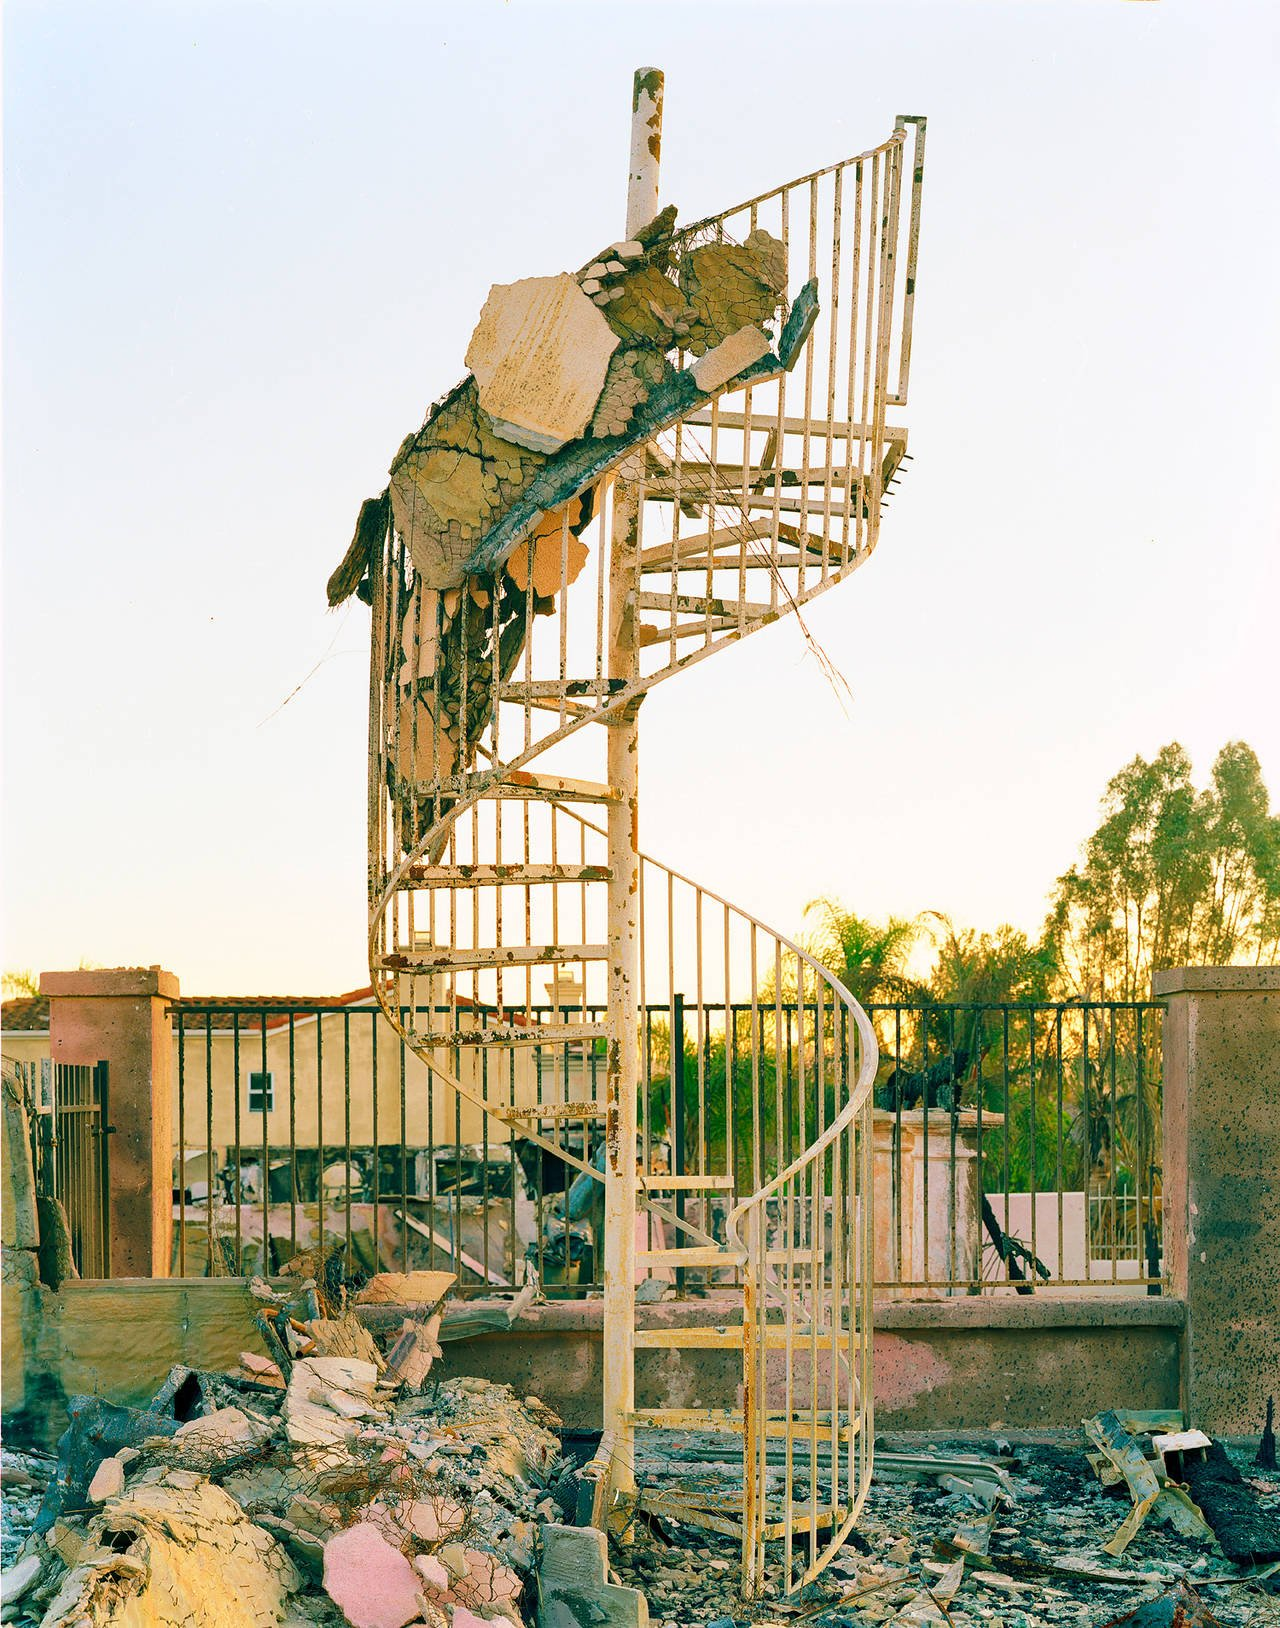 Wildfire #78, Witch Creek Fire, Rancho Bernardo, CA, 2007